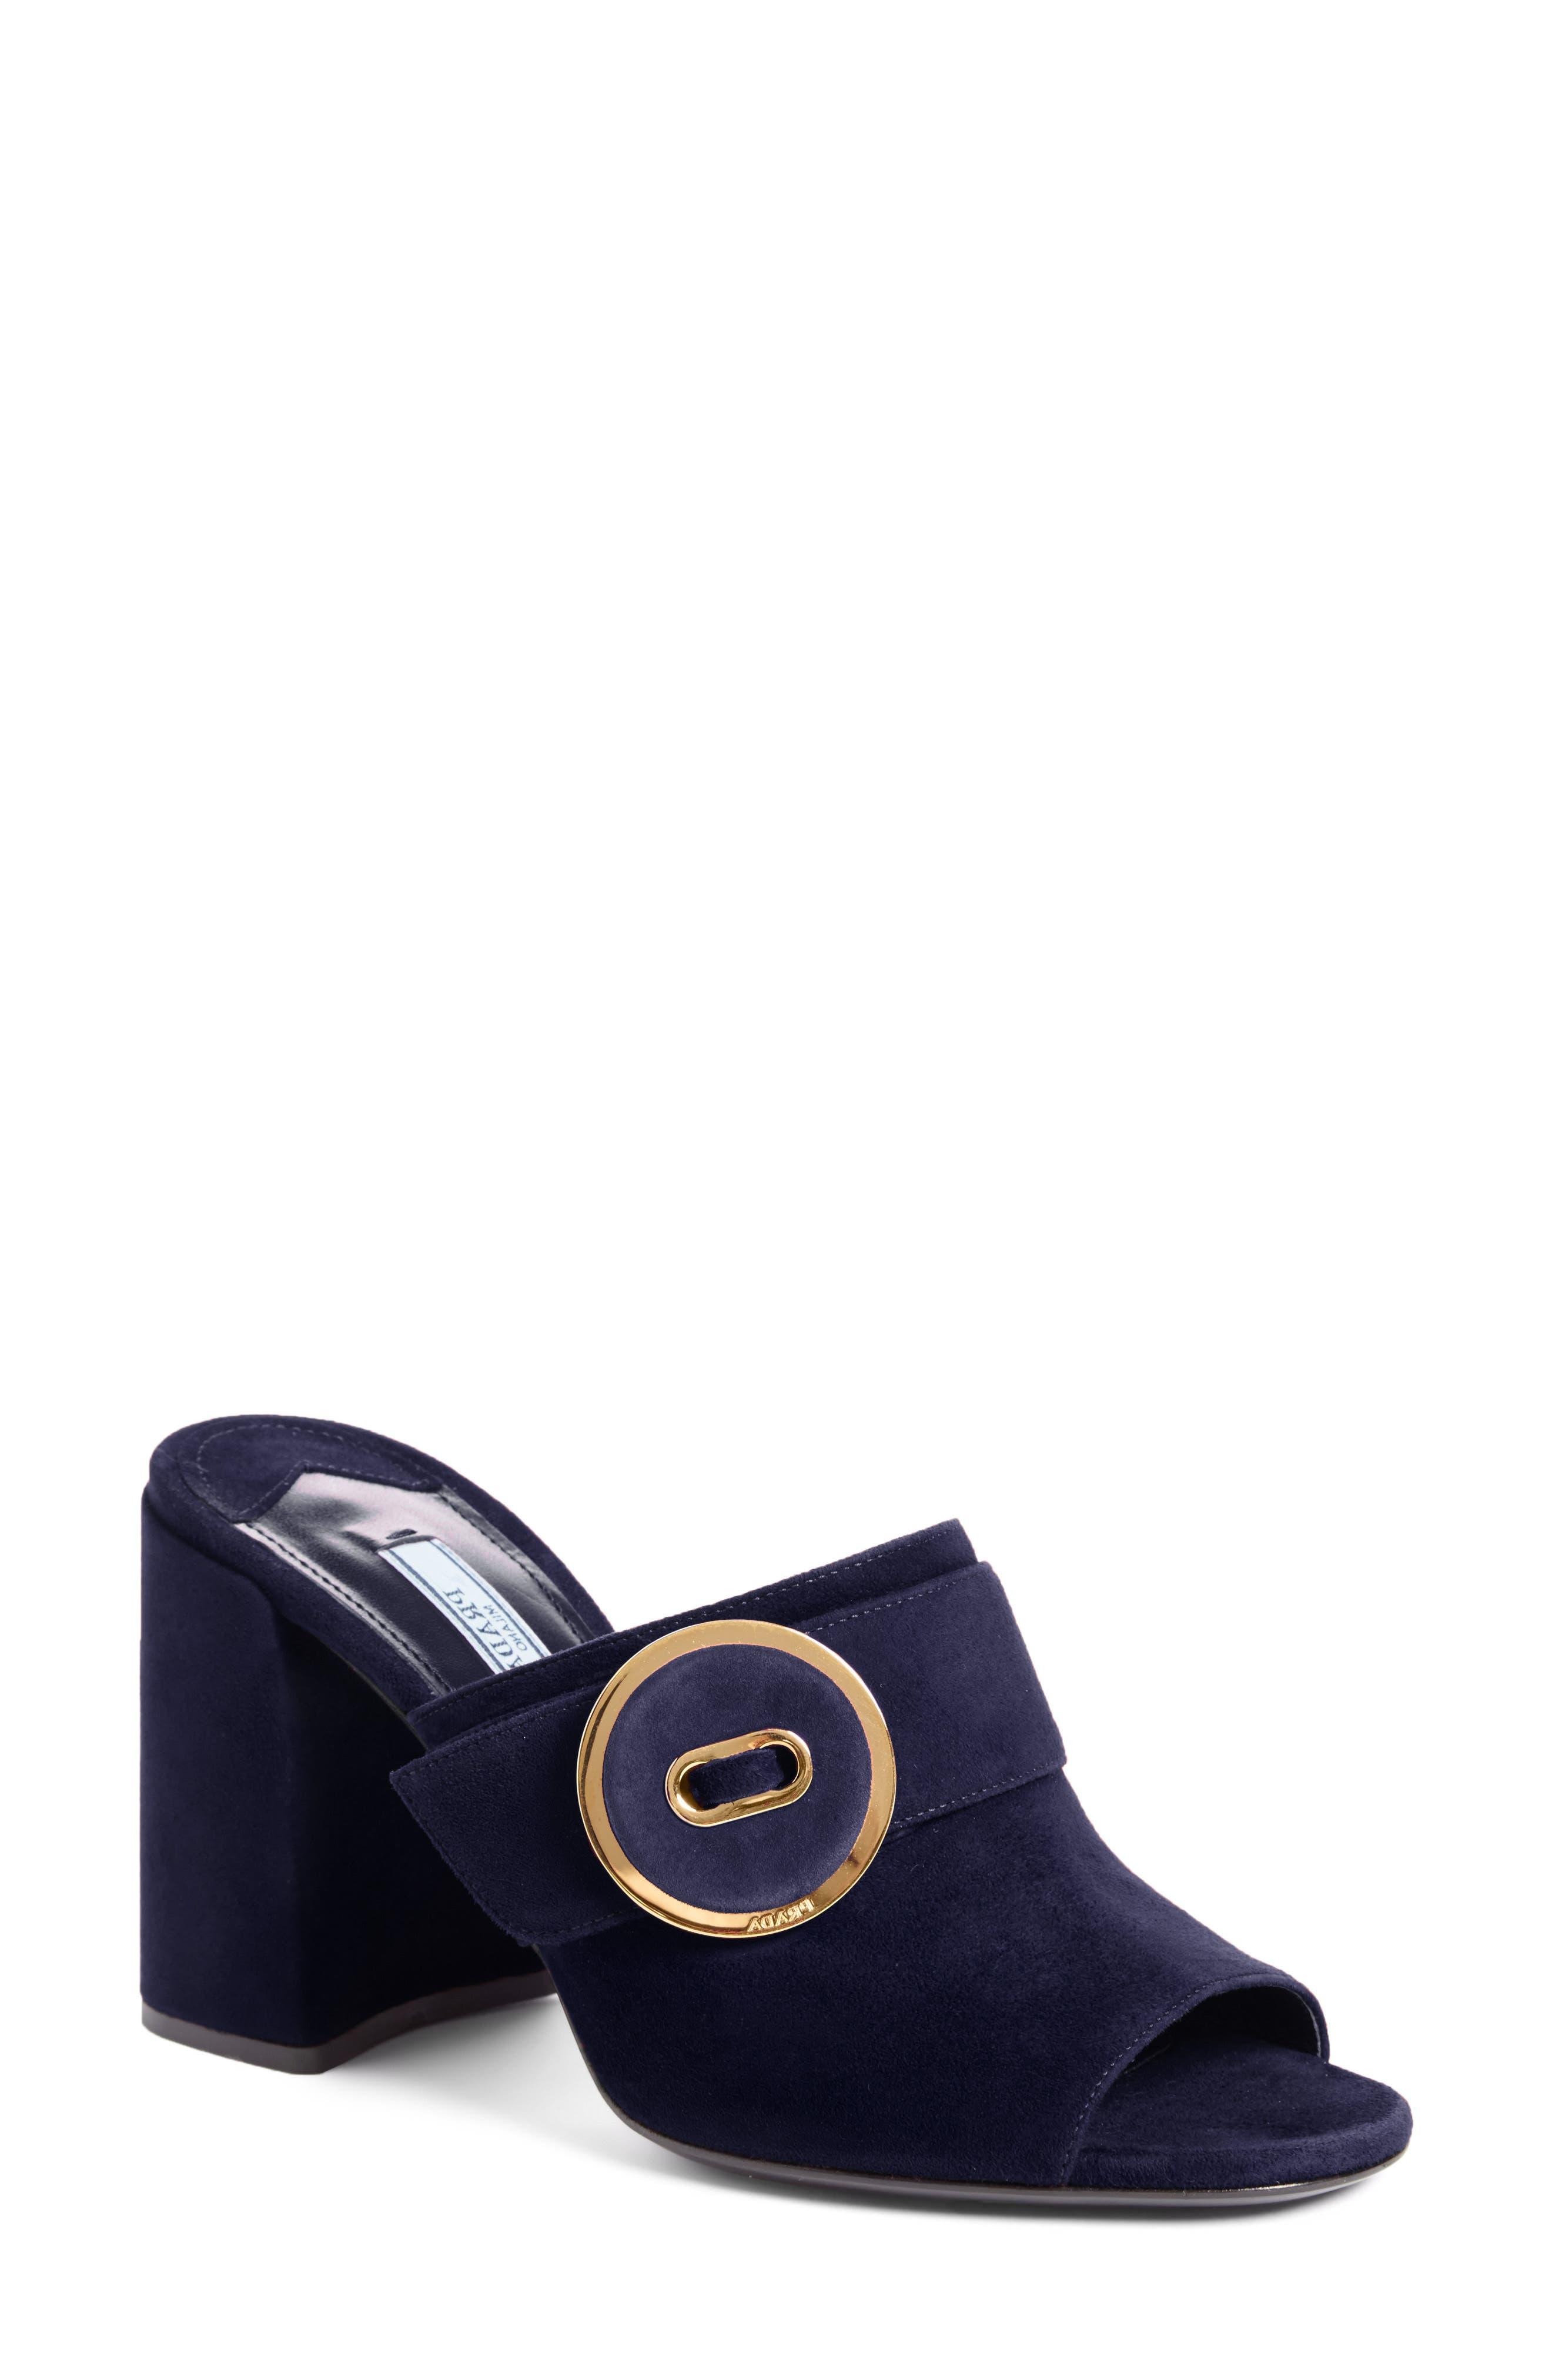 Button Mule,                         Main,                         color, Dark Blue